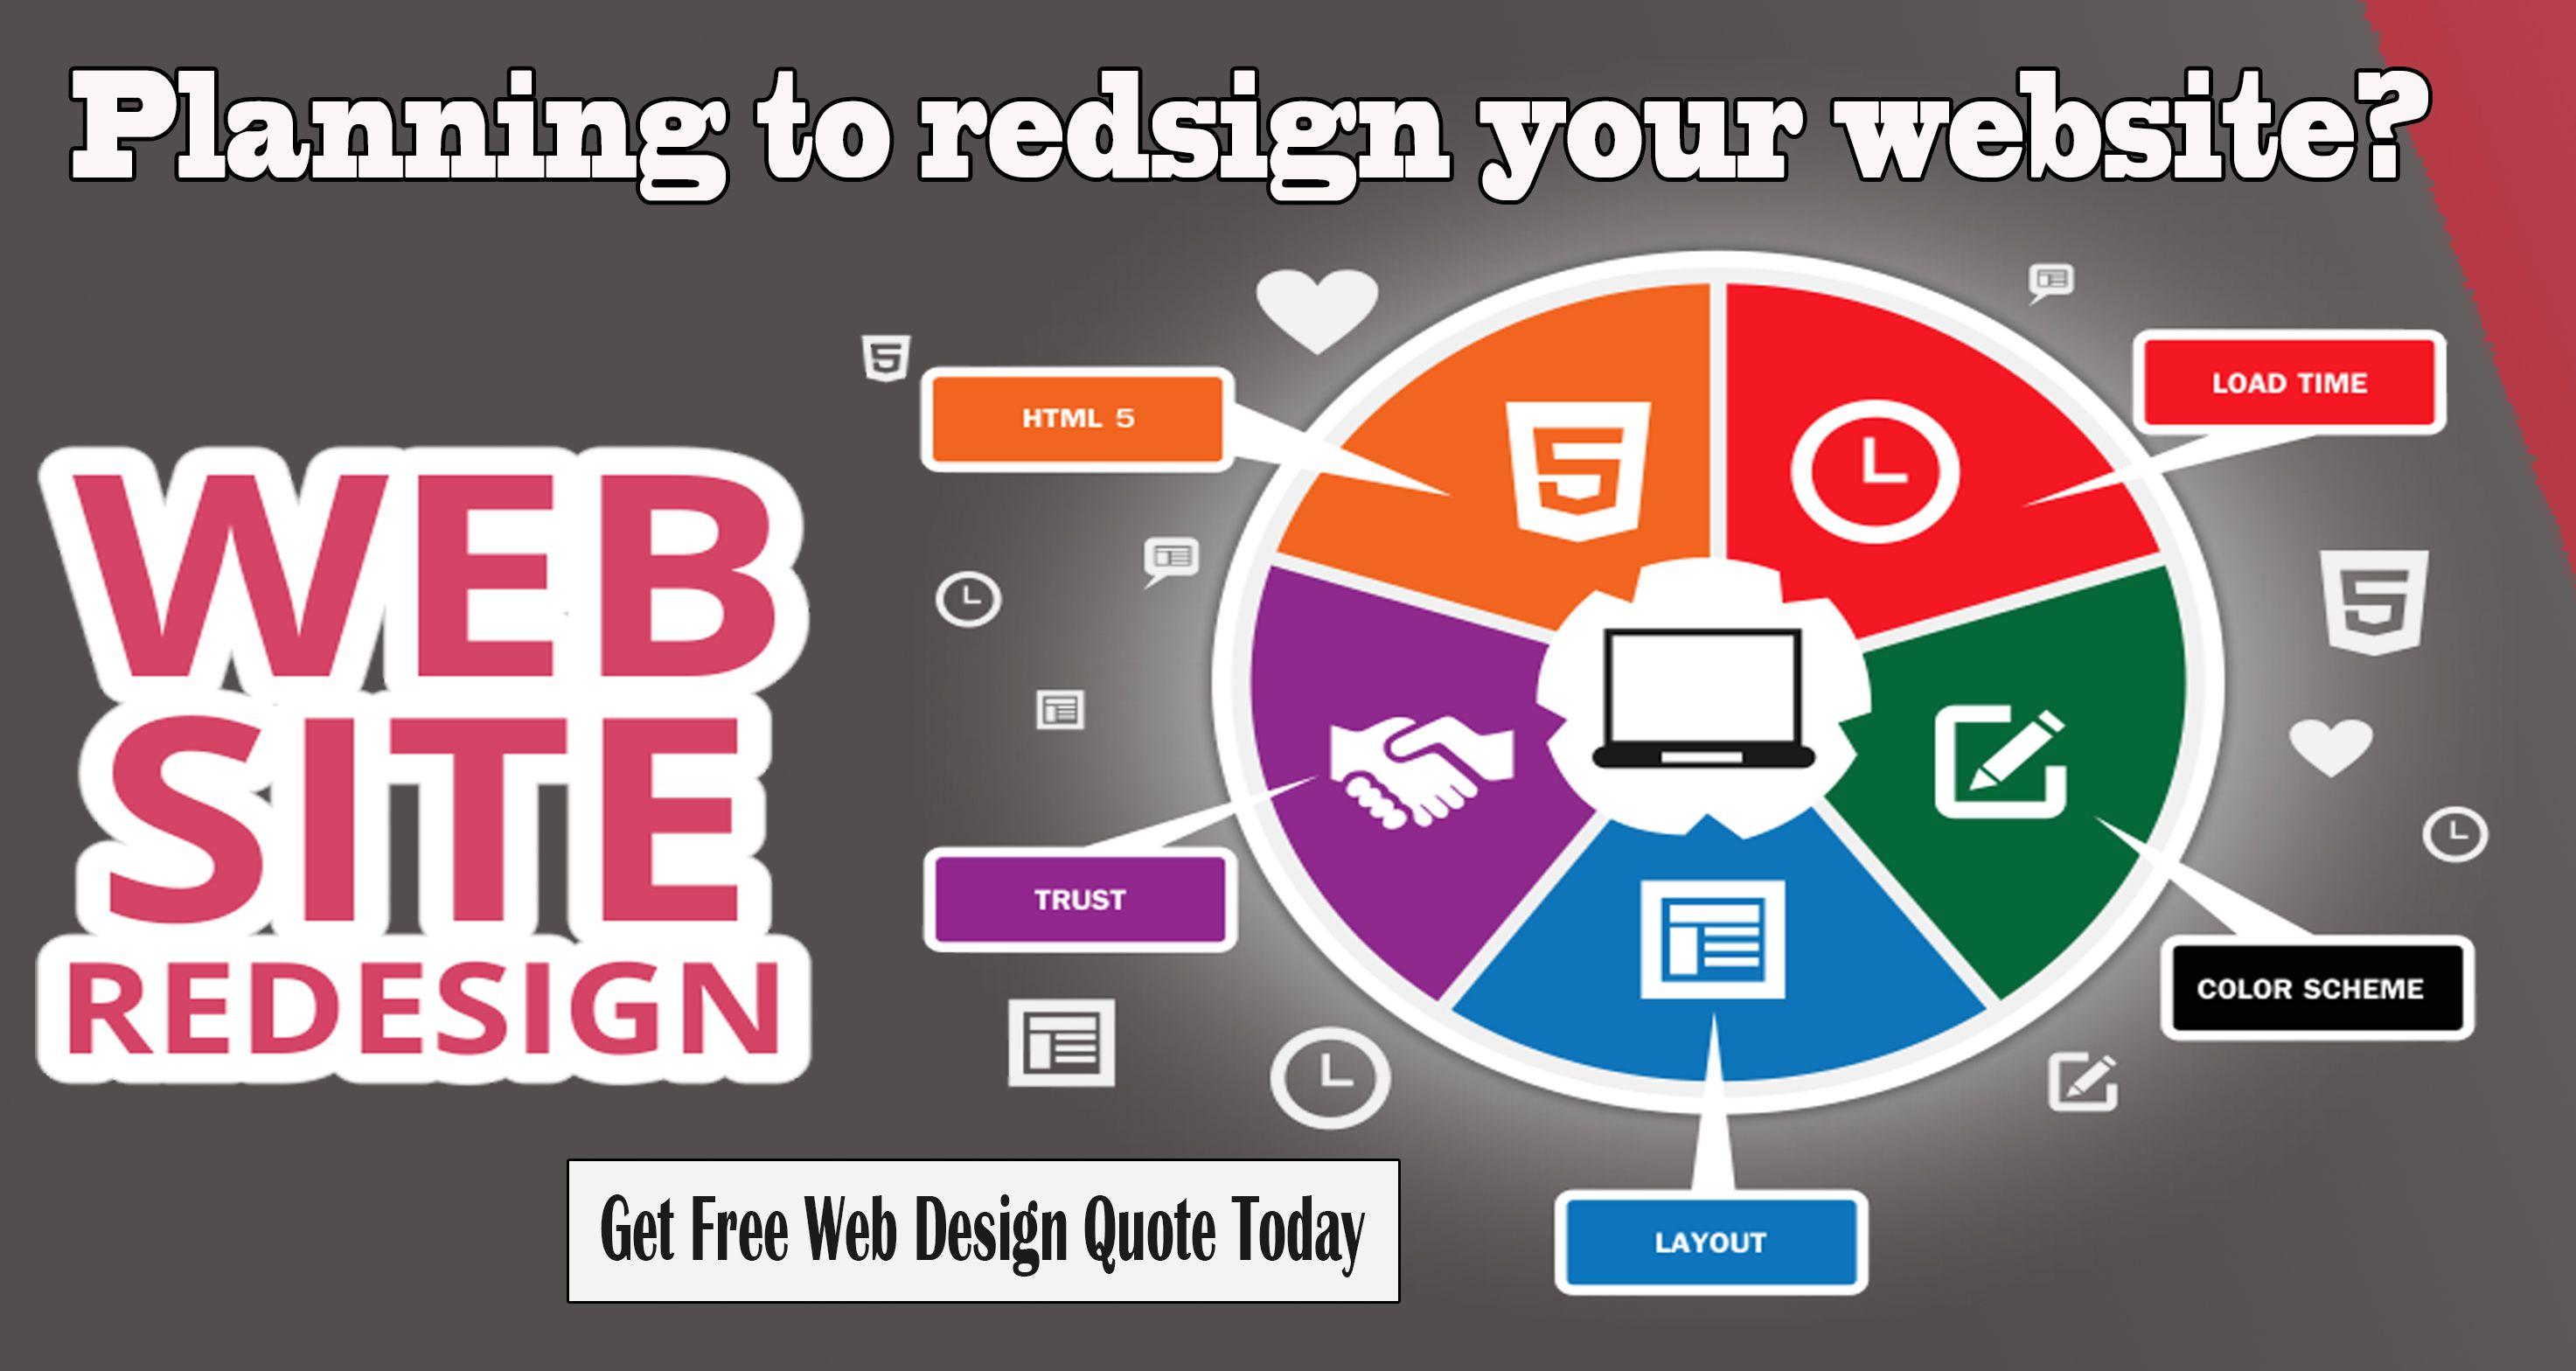 Web Design London Cheap Web Design Services Company Uk Web Design Quotes Free Web Design Cheap Web Design